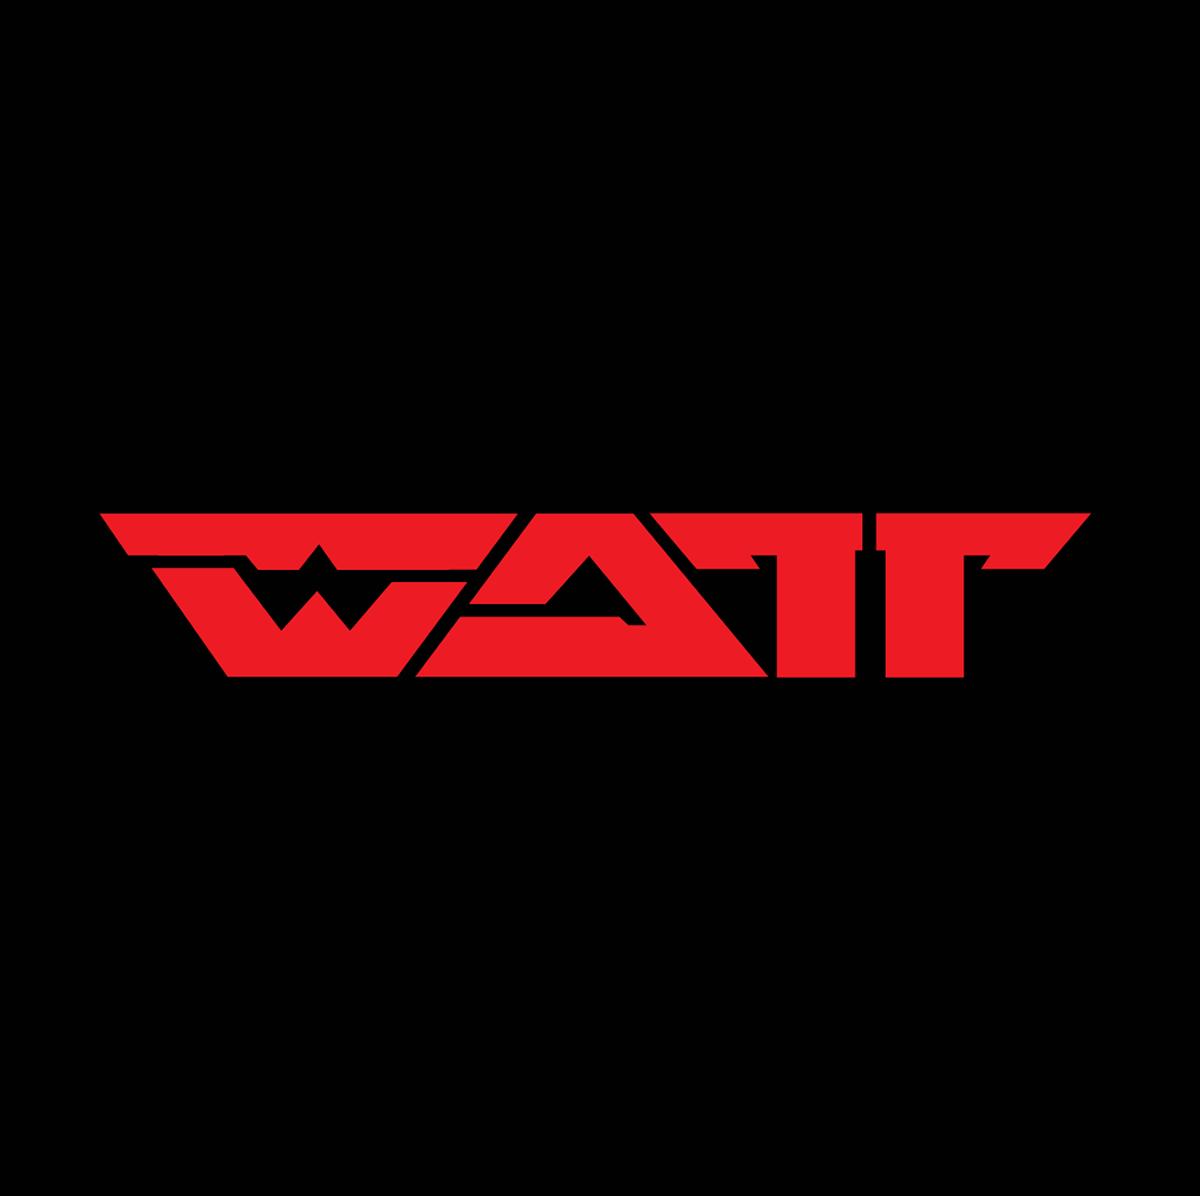 James Watt Ratt Mashup Shirt By Monsters Of Grok